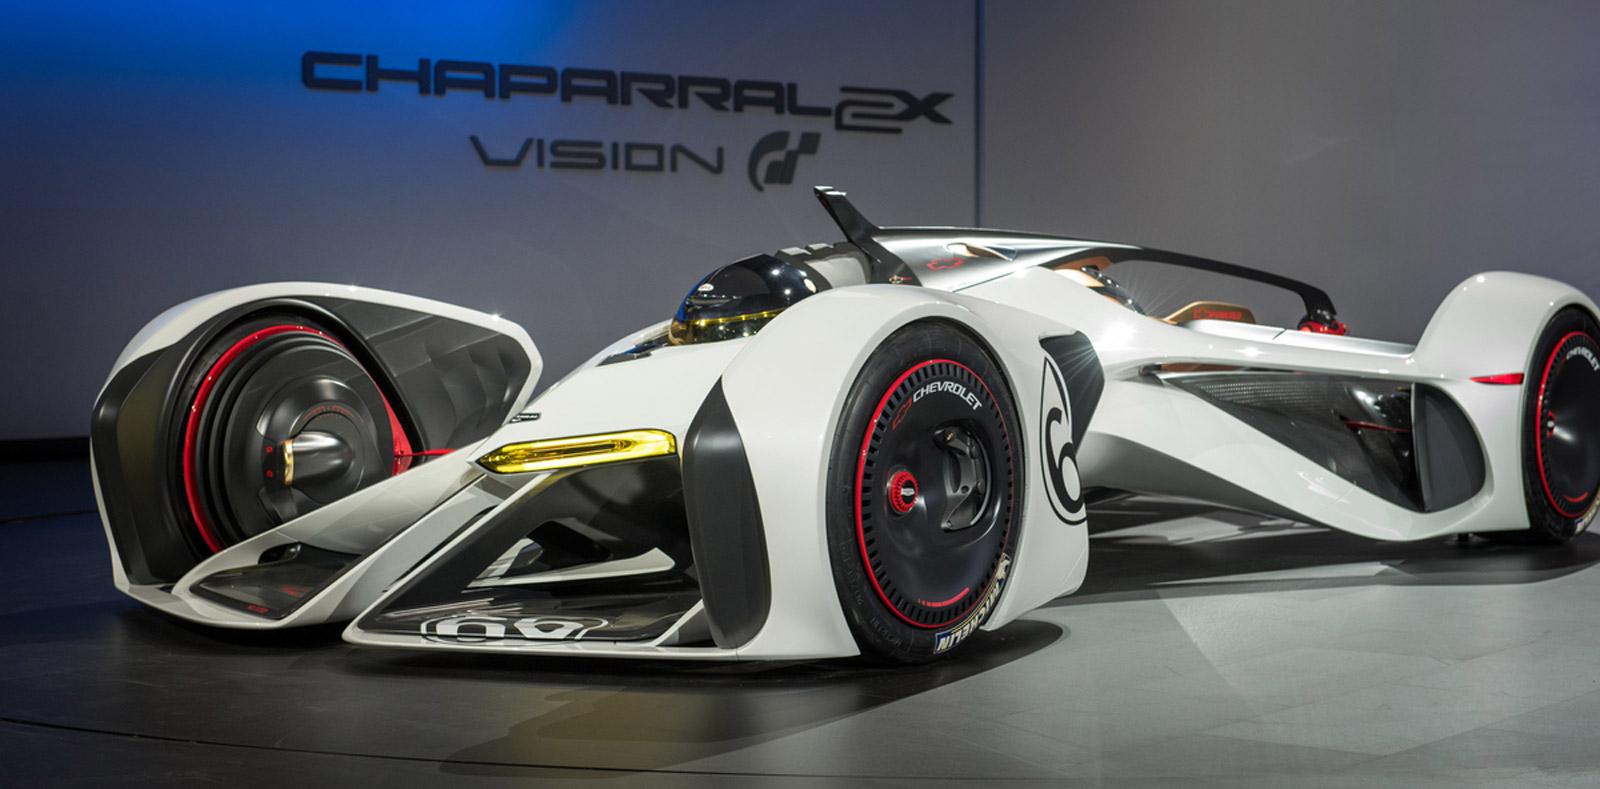 Chevy Chaparral 2x Vision Gran Turismo Concept Makes Its L